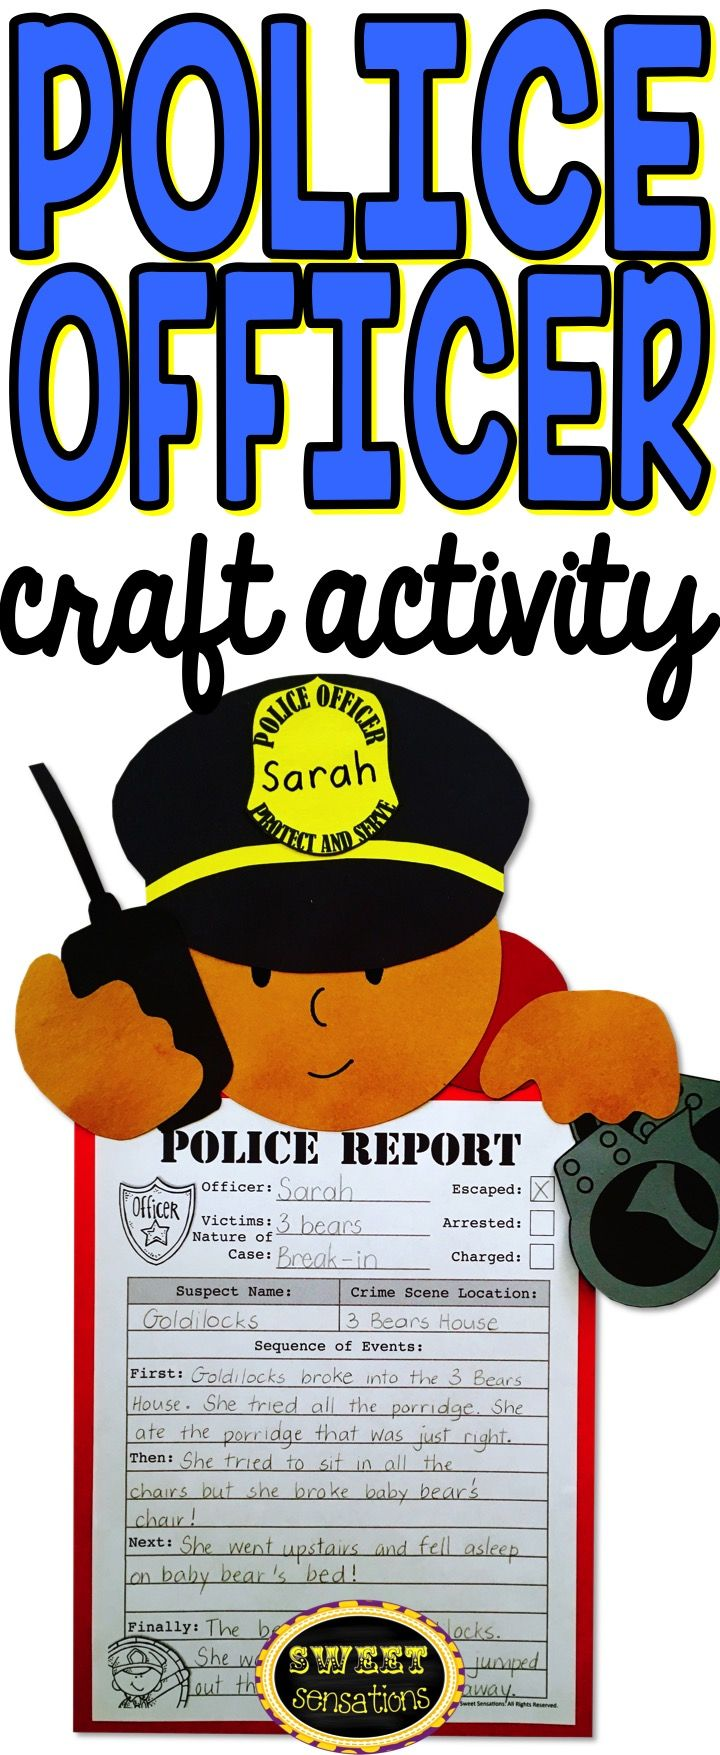 Police Officer Community Helper craft activity